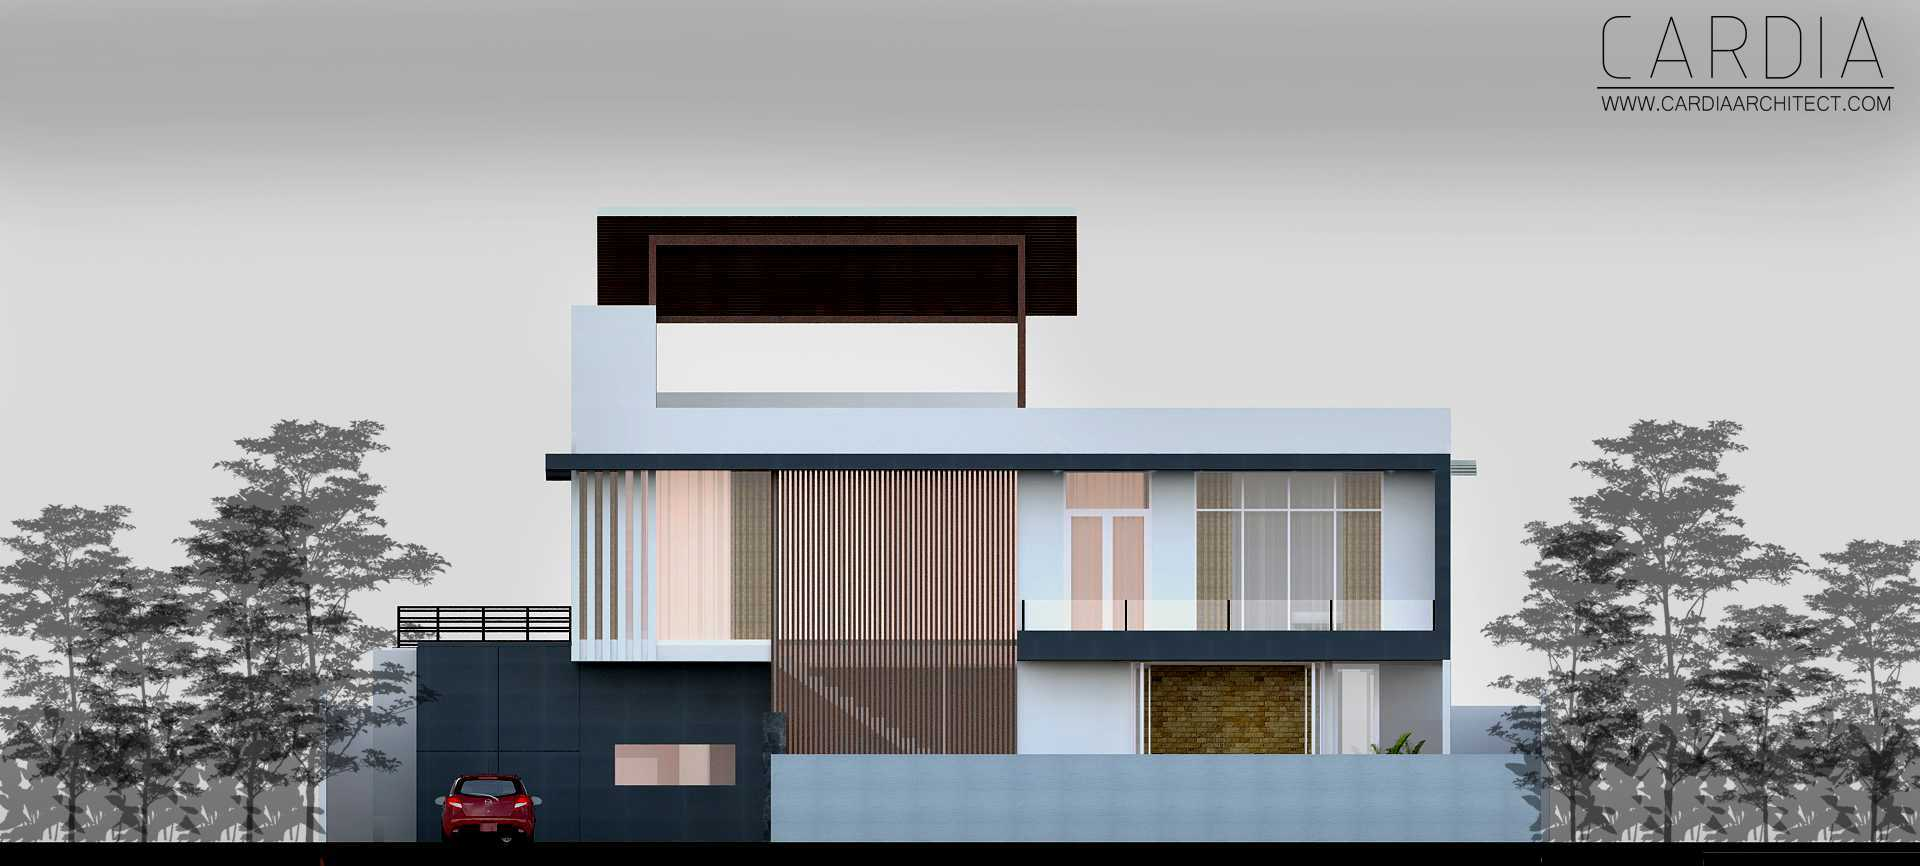 Cardia Architect Mr House Maumere, Kota Uneng, Alok, Kabupaten Sikka, Nusa Tenggara Tim., Indonesia Maumere Front View   21580